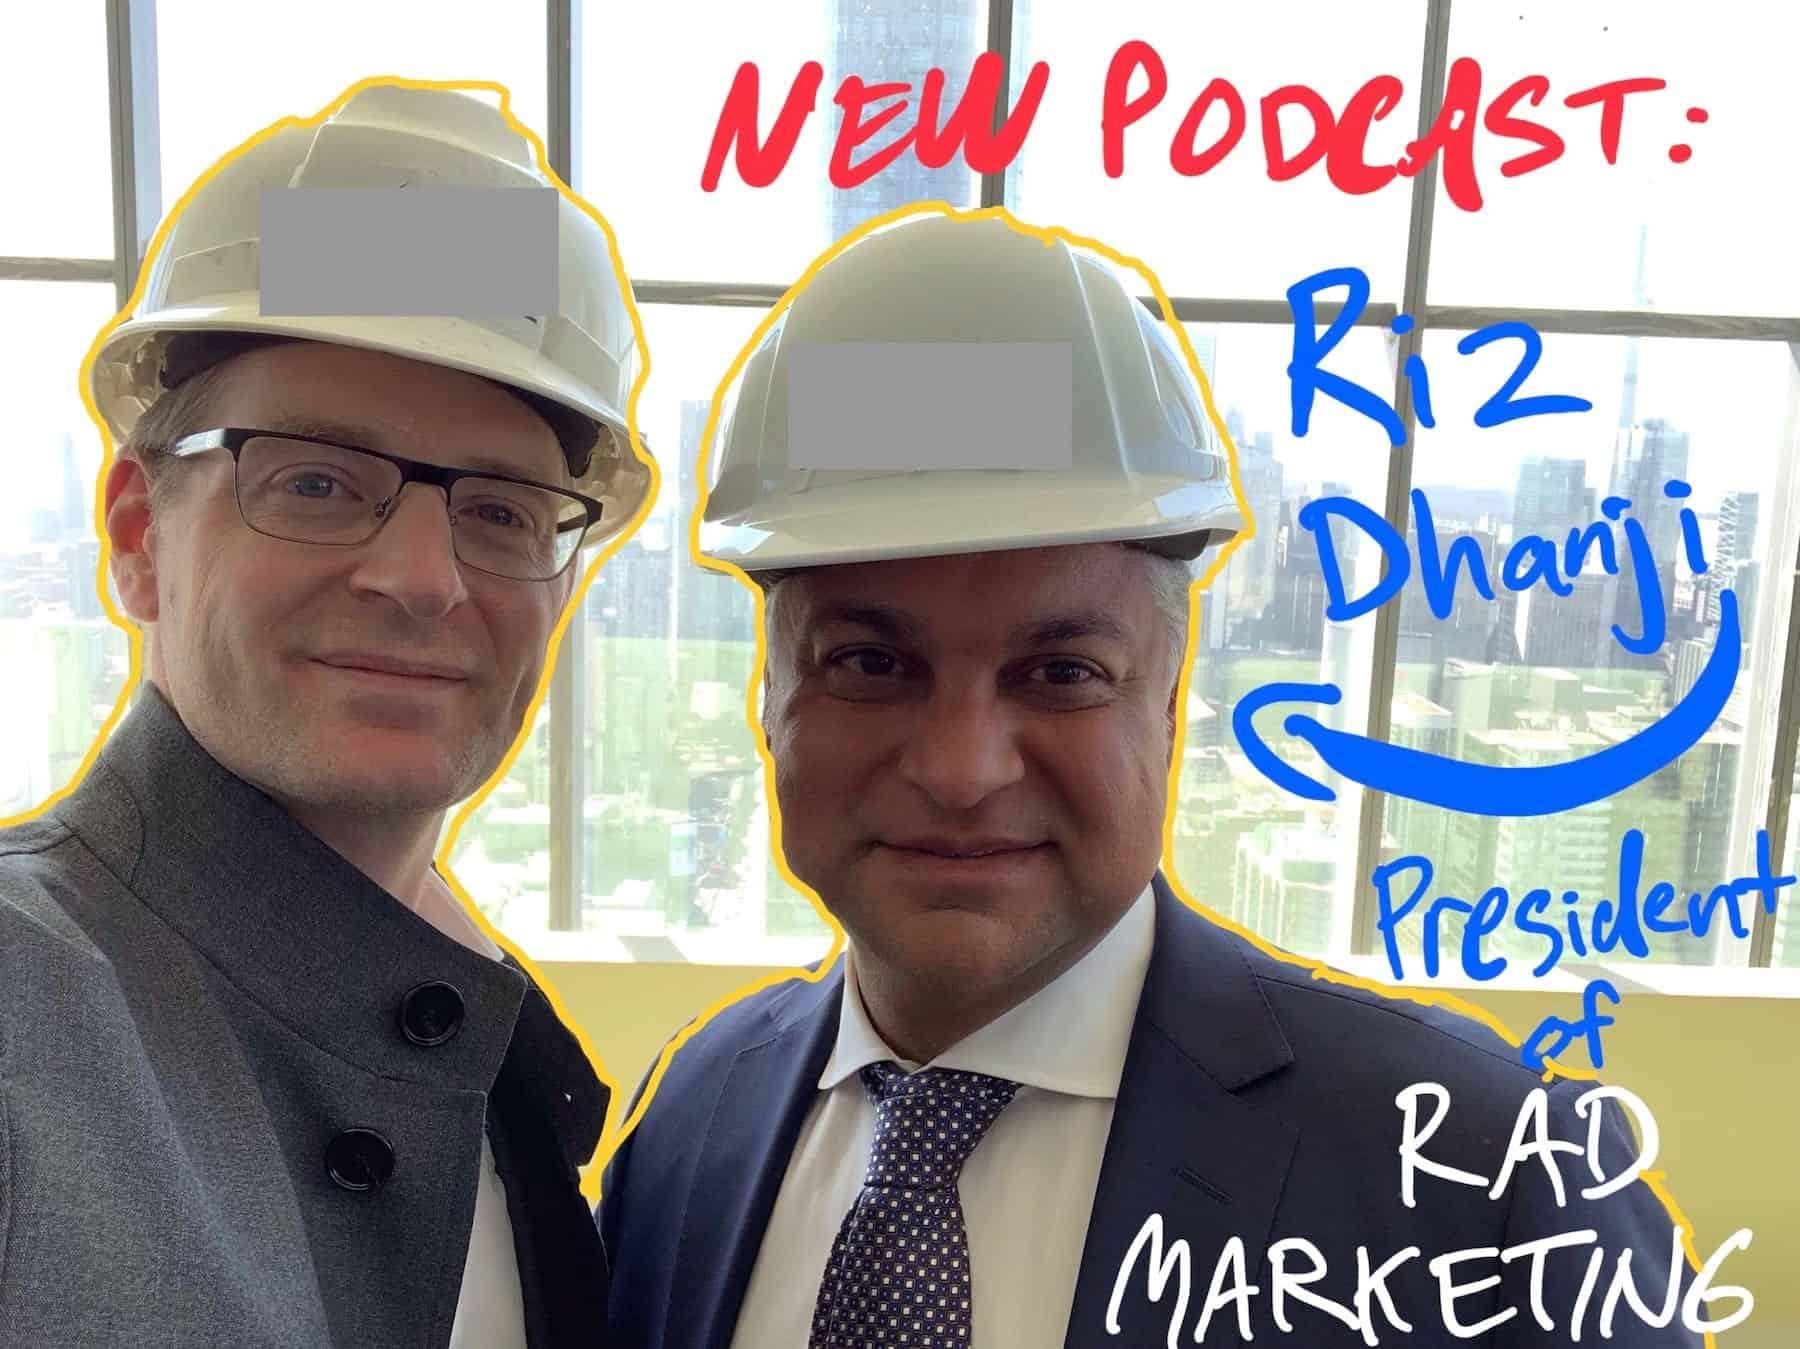 Riz Dhanji President of RAD Marketing True Condos Podcast Andrew la Fleur